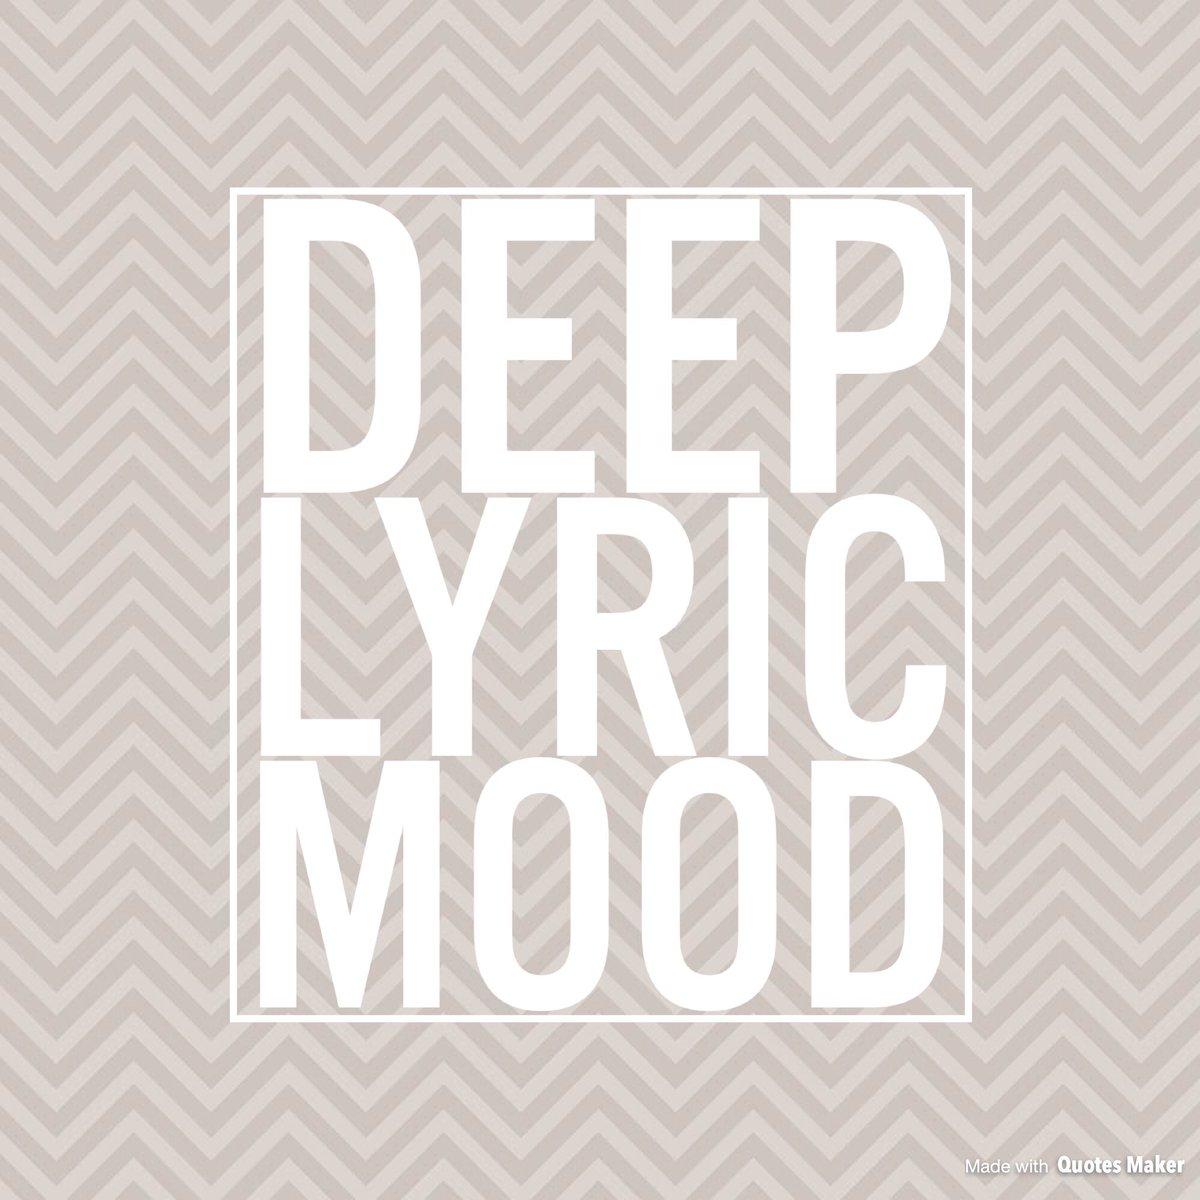 Deep Lyric Mood Deeplyricmood Twitter